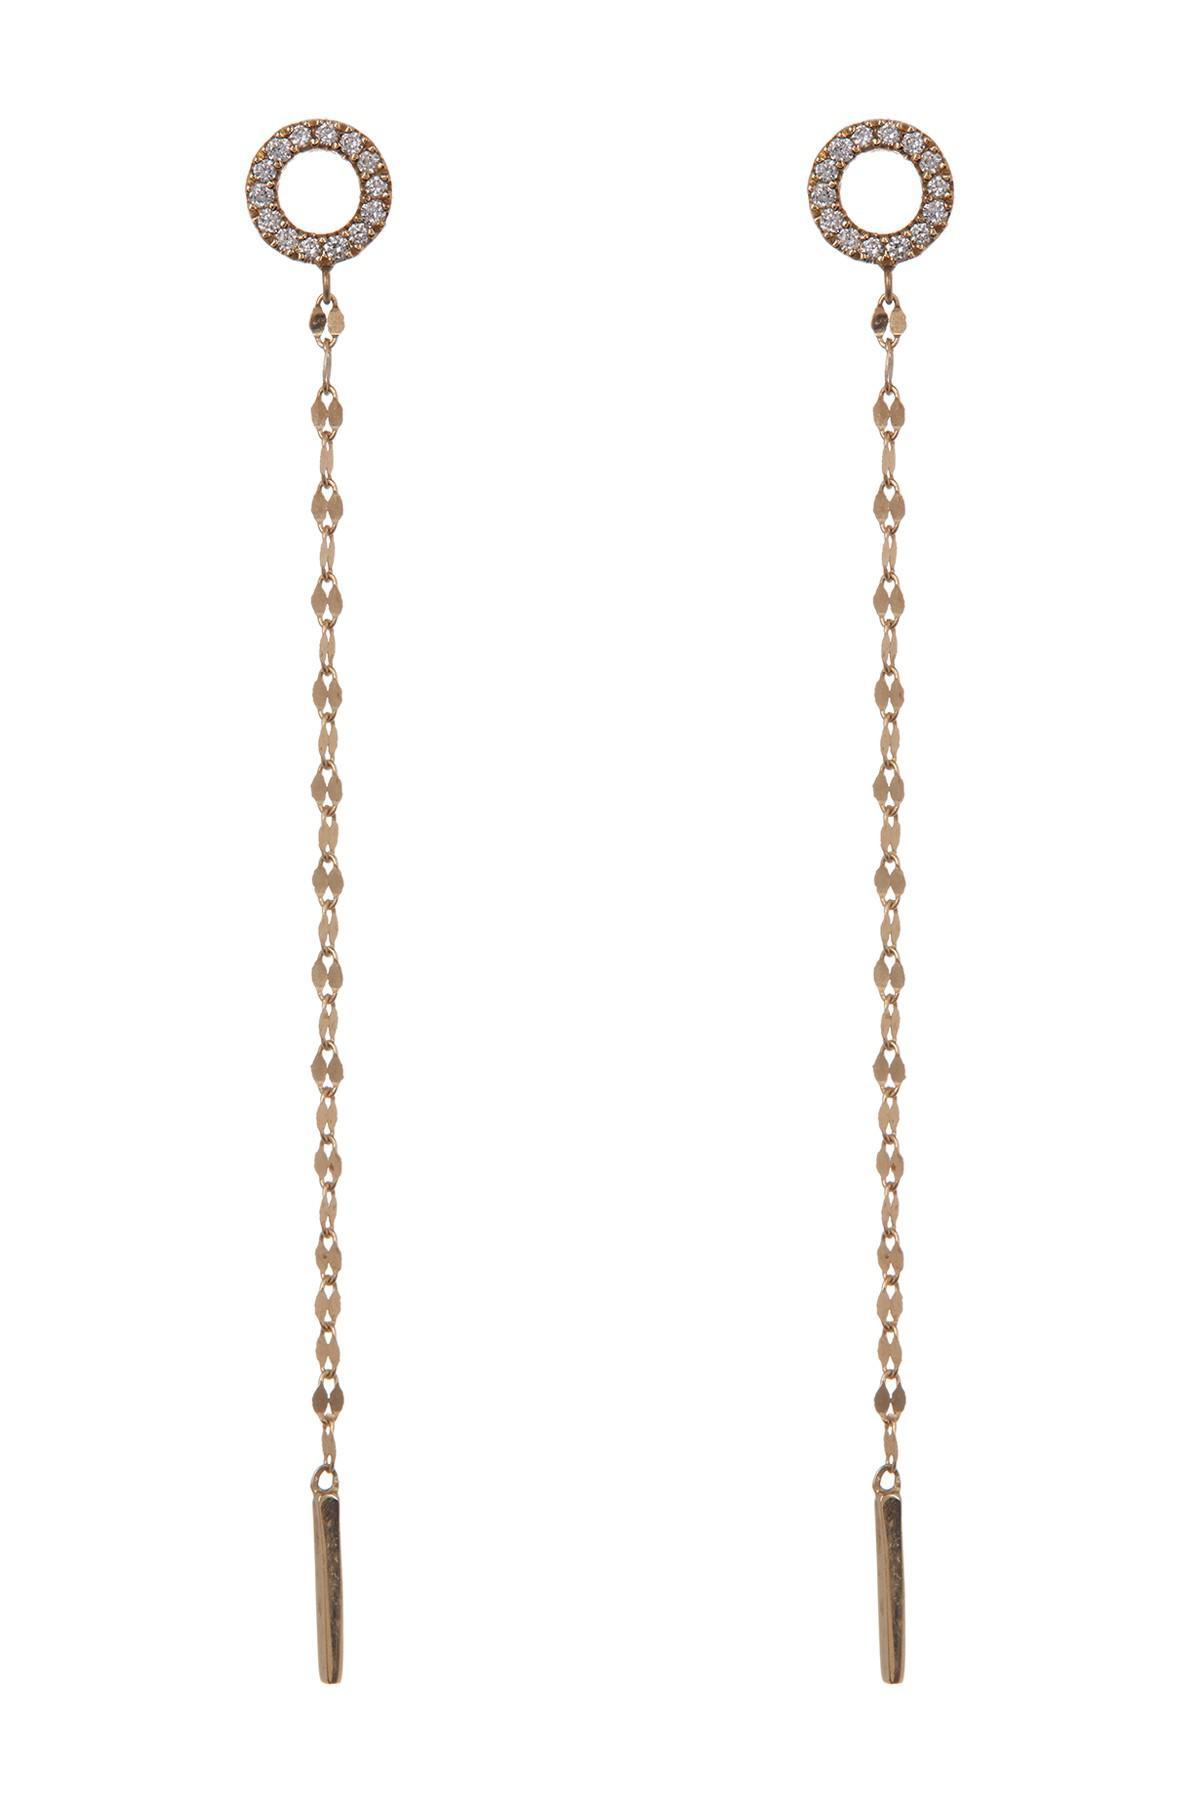 Lana Jewelry Multi-Circle Linear Drop Earrings aJxdpp